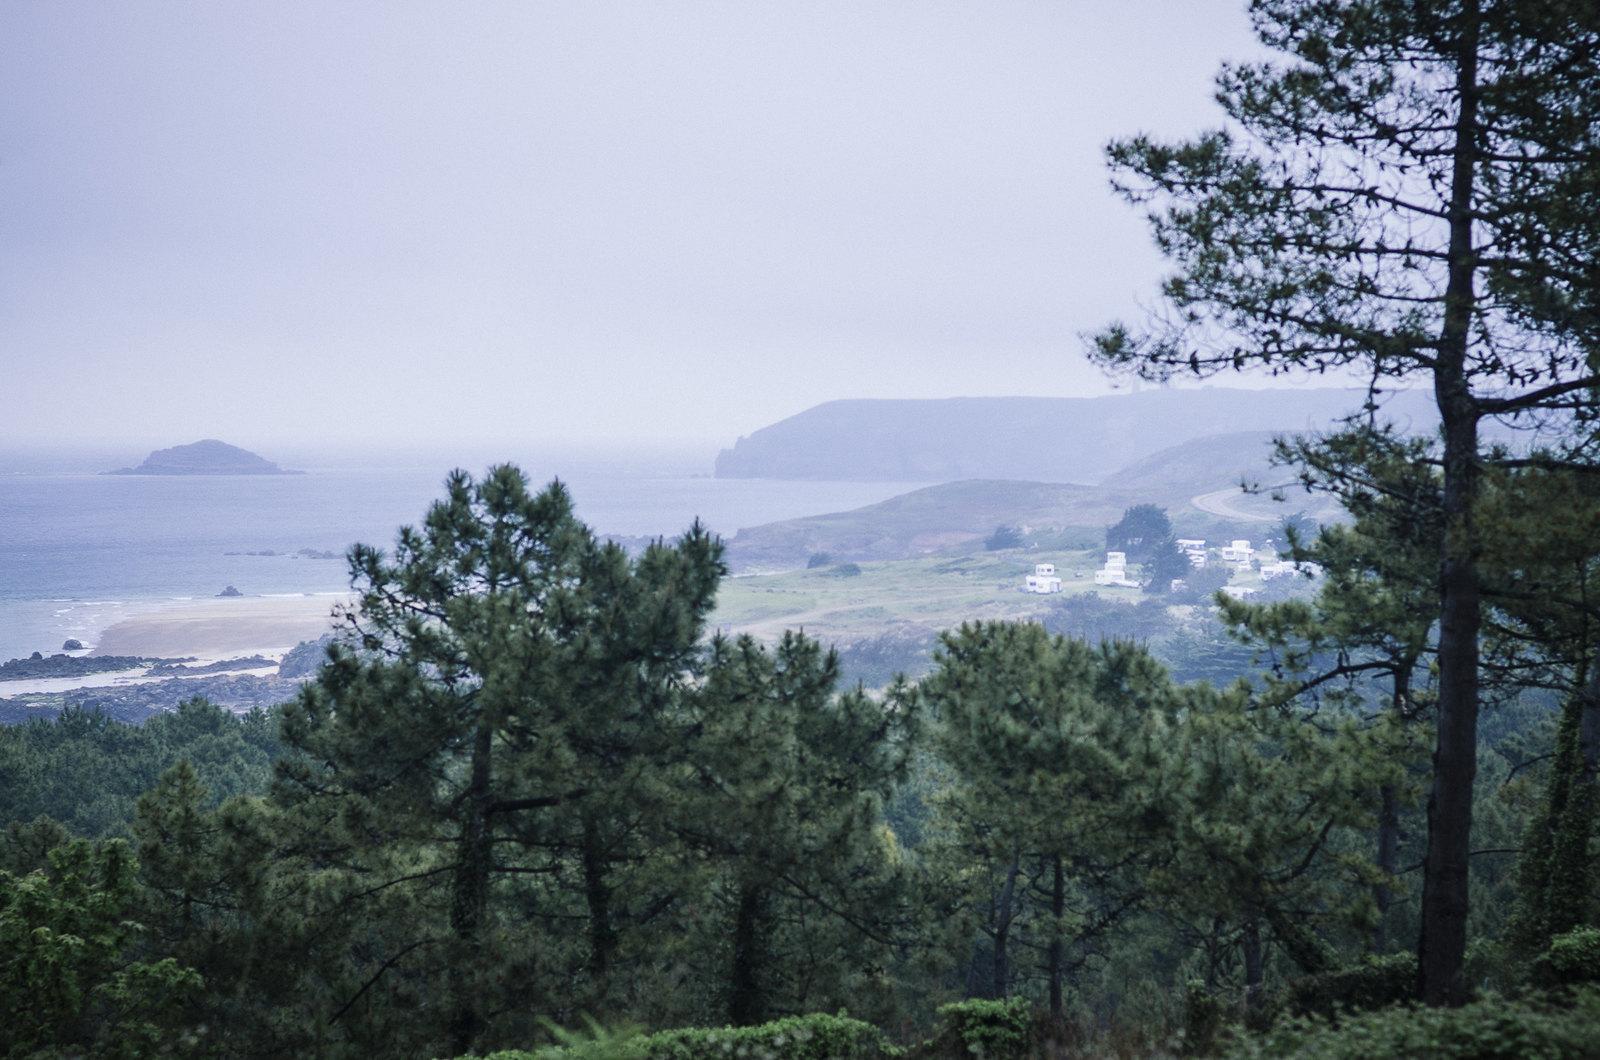 Grands sites de la côte d'émeraude - Camping municipal de Fréhel